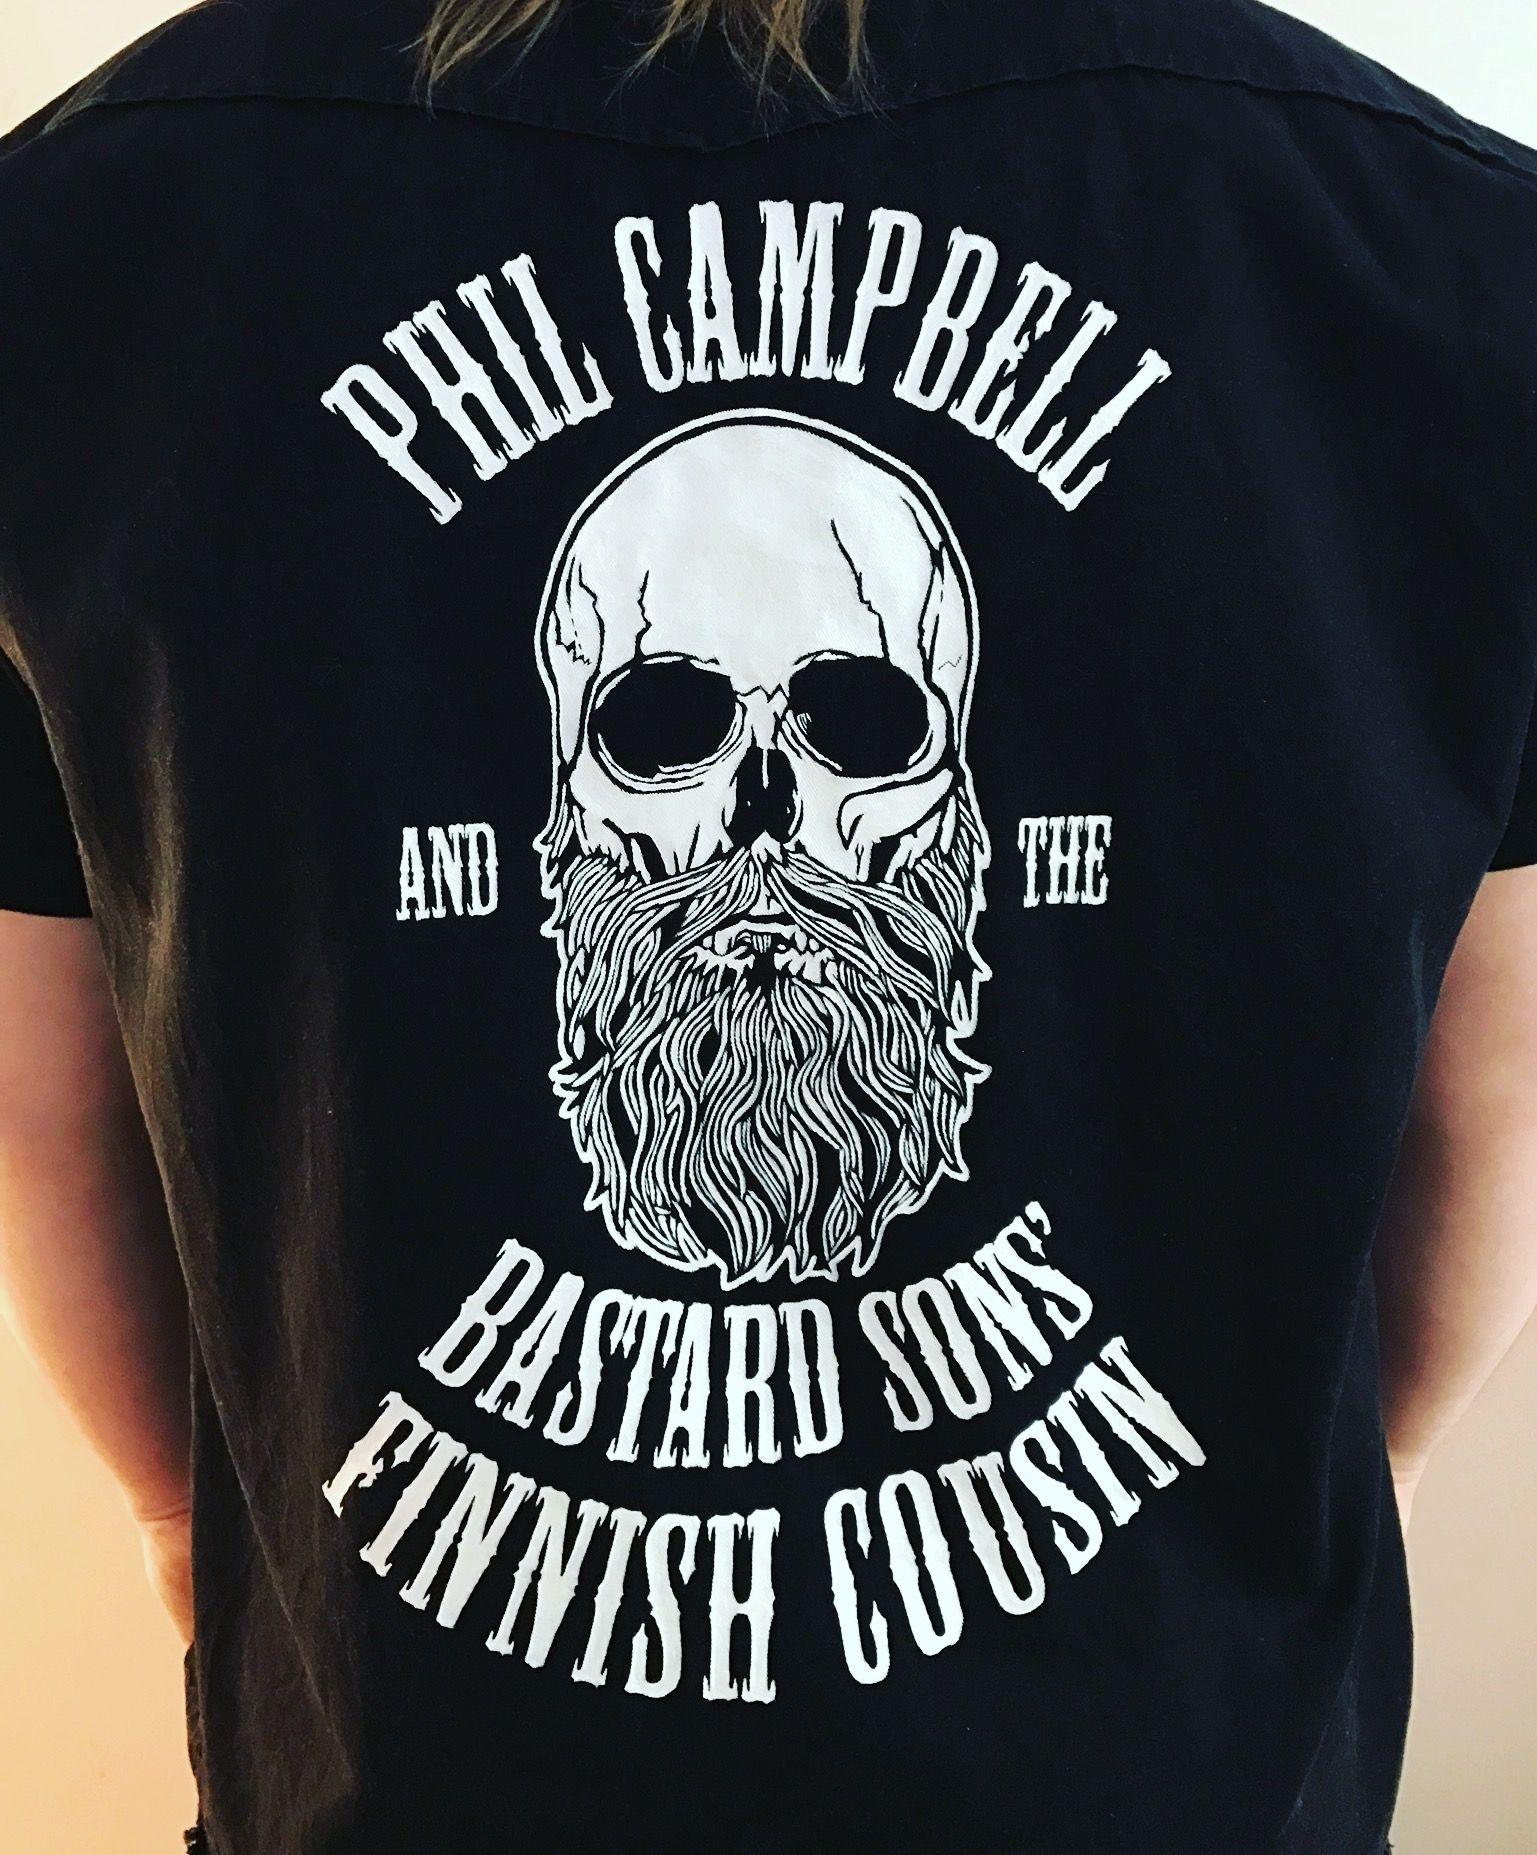 551ae33f0384e Hand painted personalized vest. Orders are welcome. #philcampbell  #philcampbellandthebastardsons #motorheadbangers #motörheadbangers #denim  #denimjacket ...